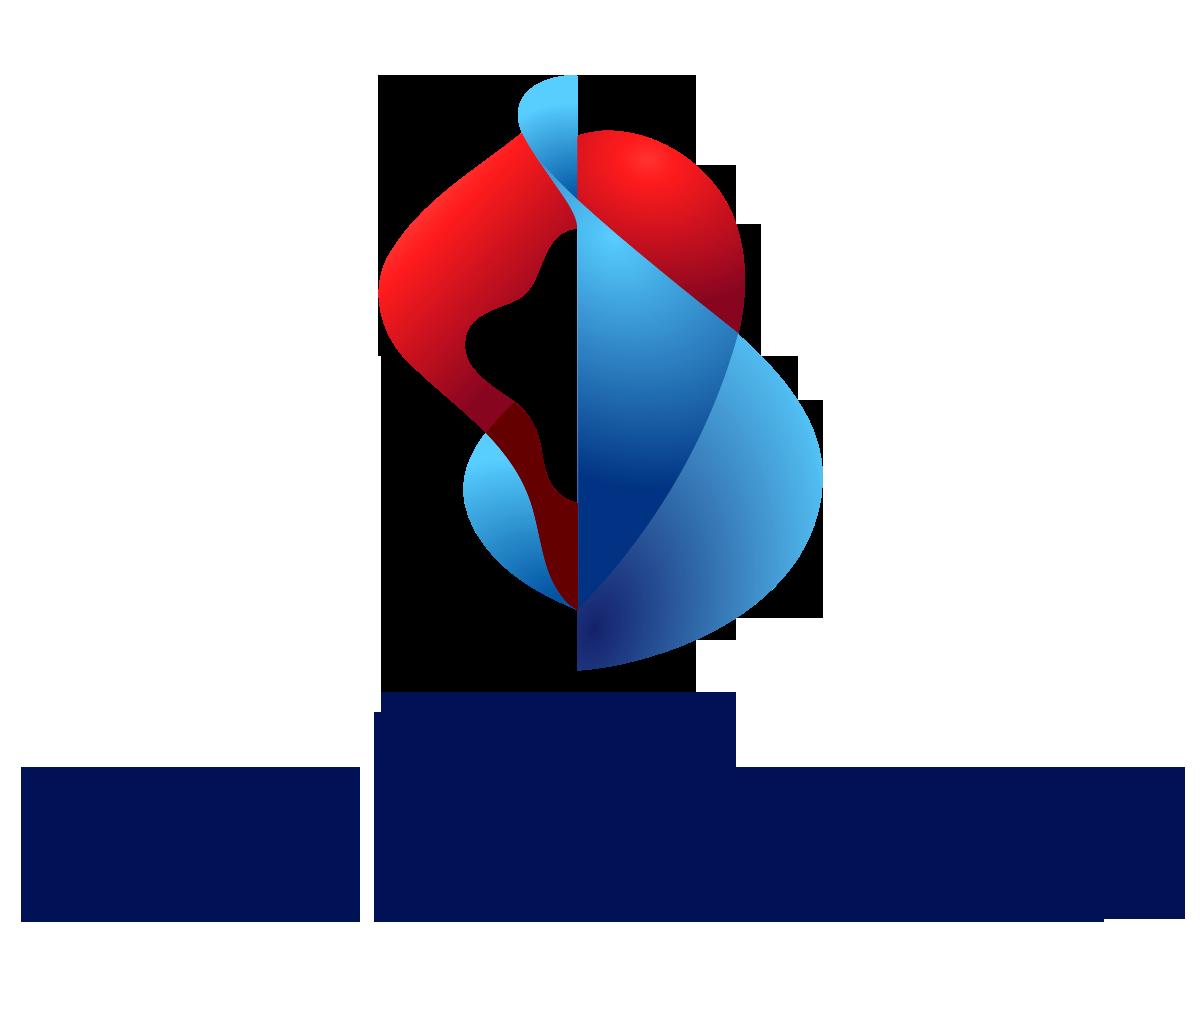 Swisscom logo and wordmark